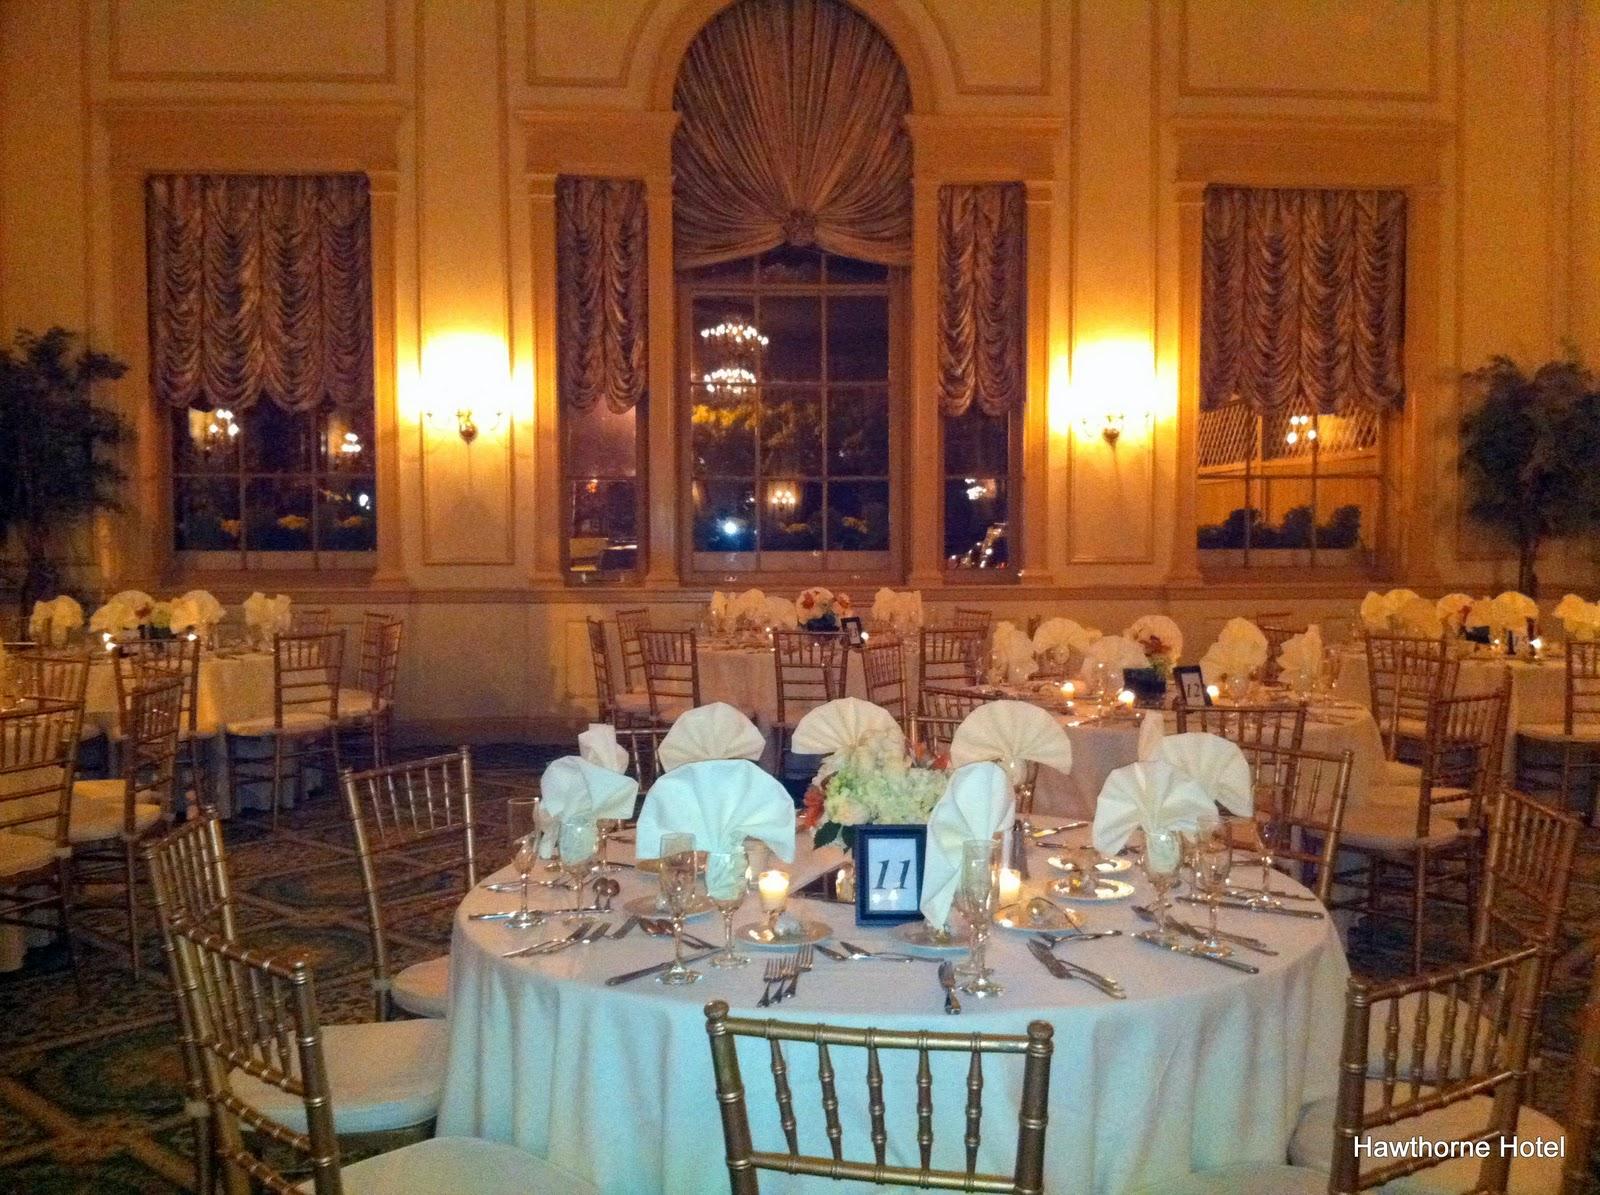 Hawthorne Hotel: November 2010